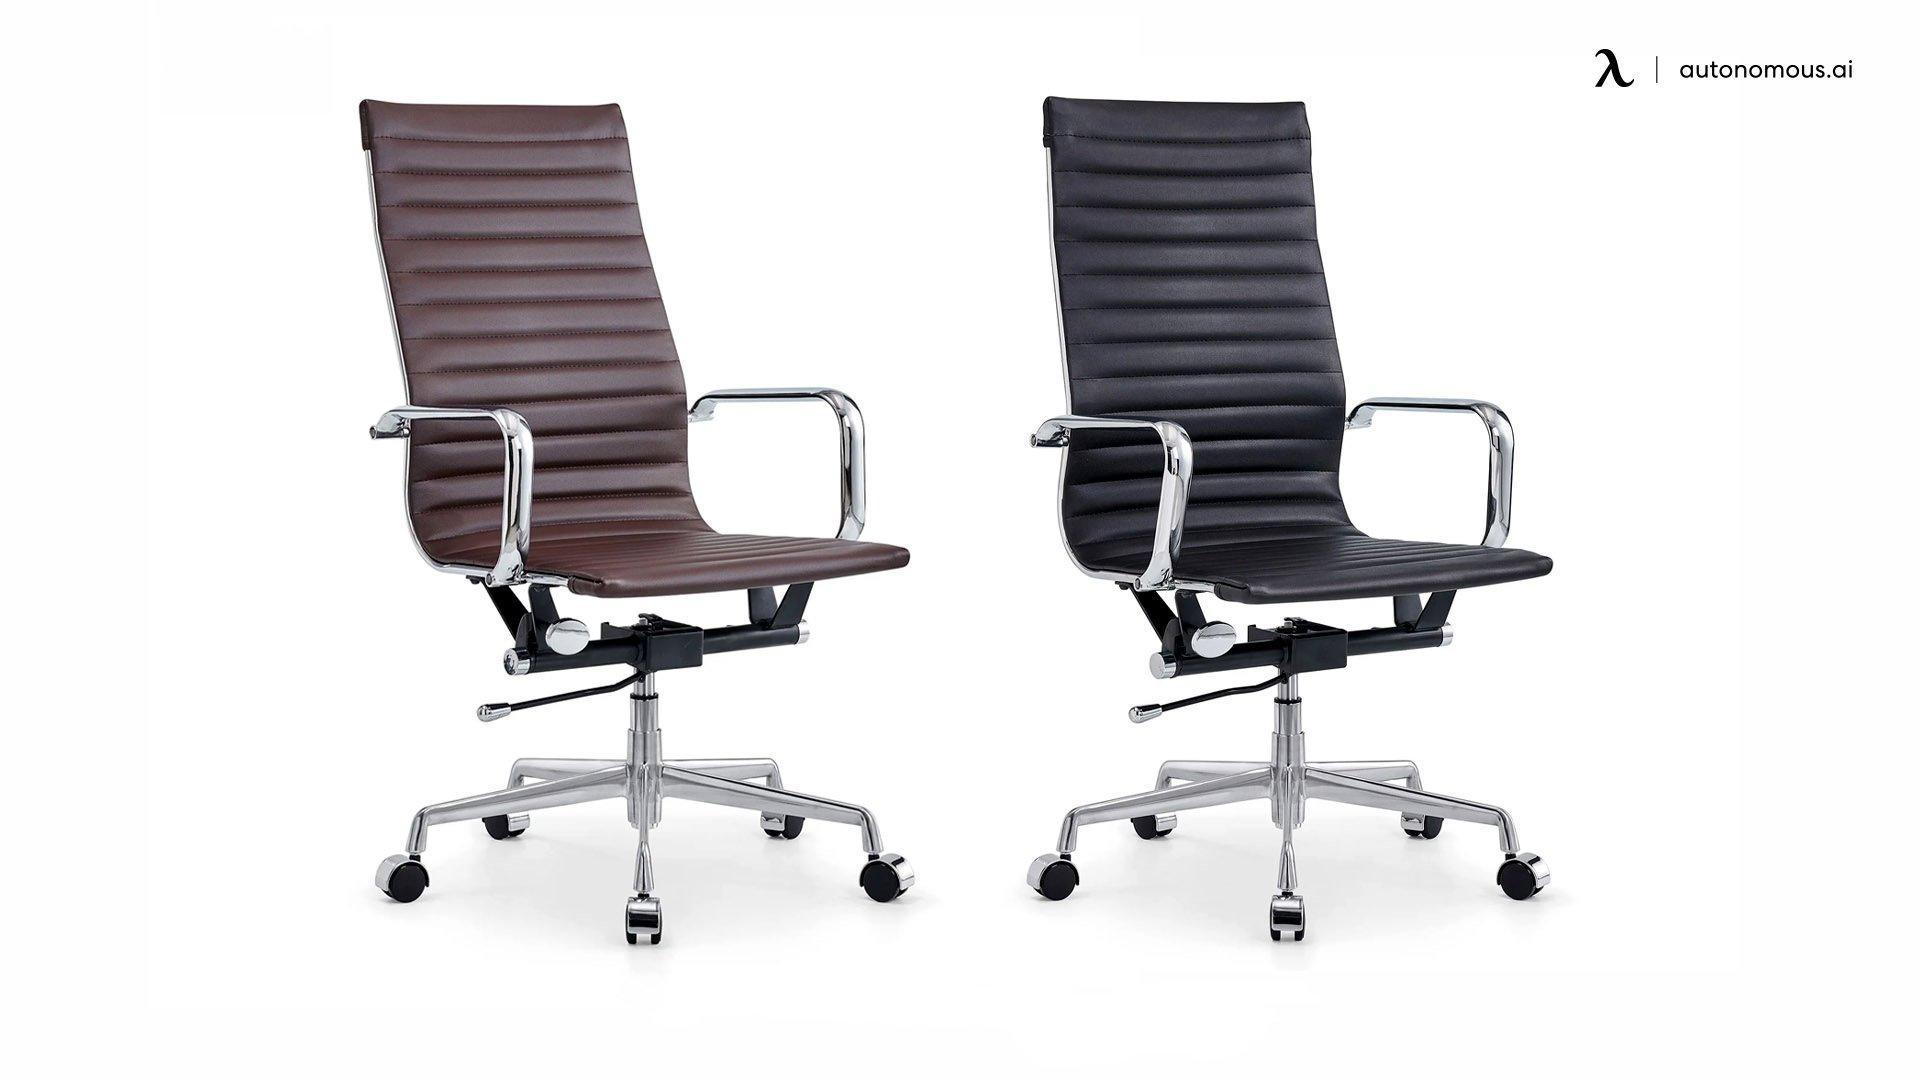 Home office ergonomic chair design